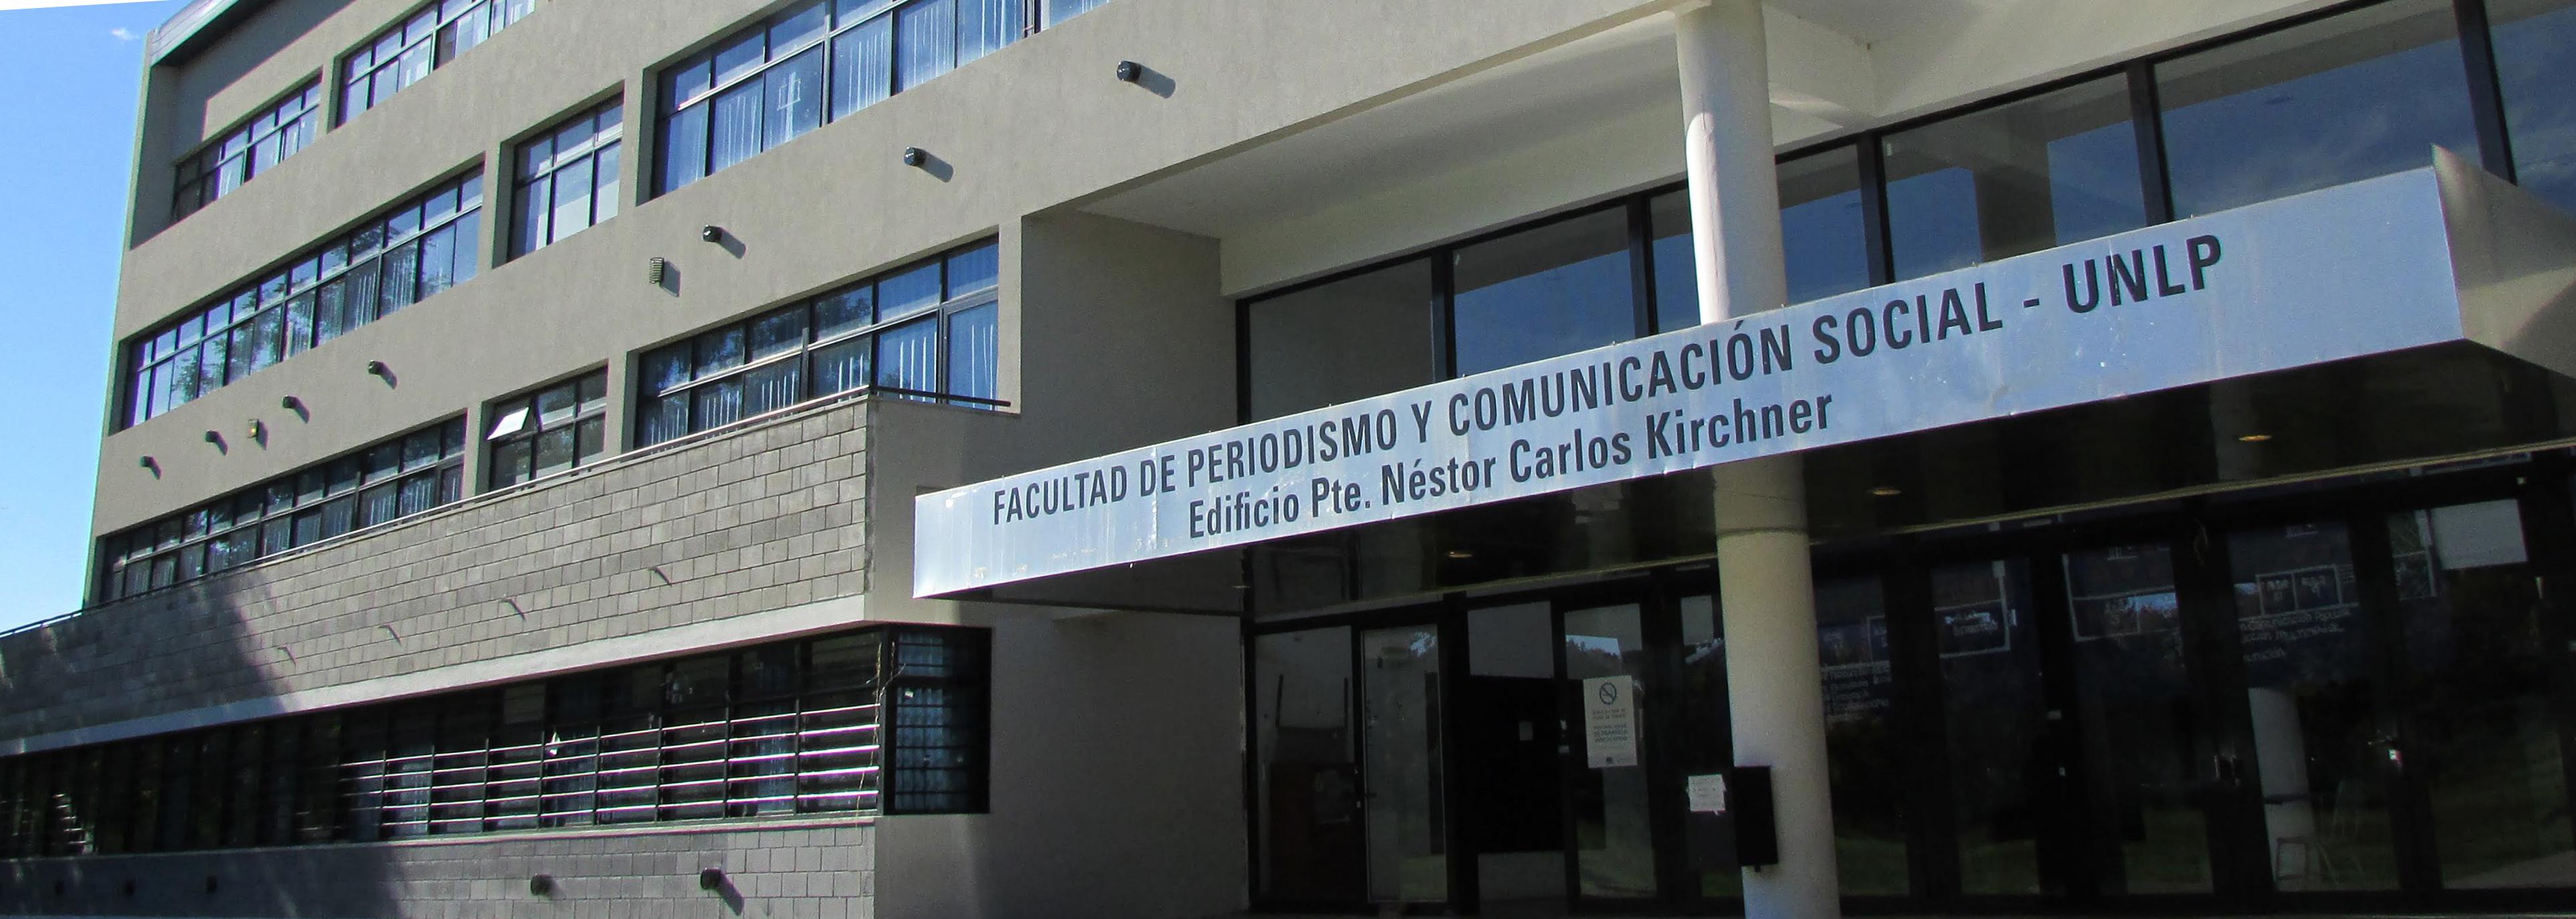 fachada del edificio Nésotr Kirchner